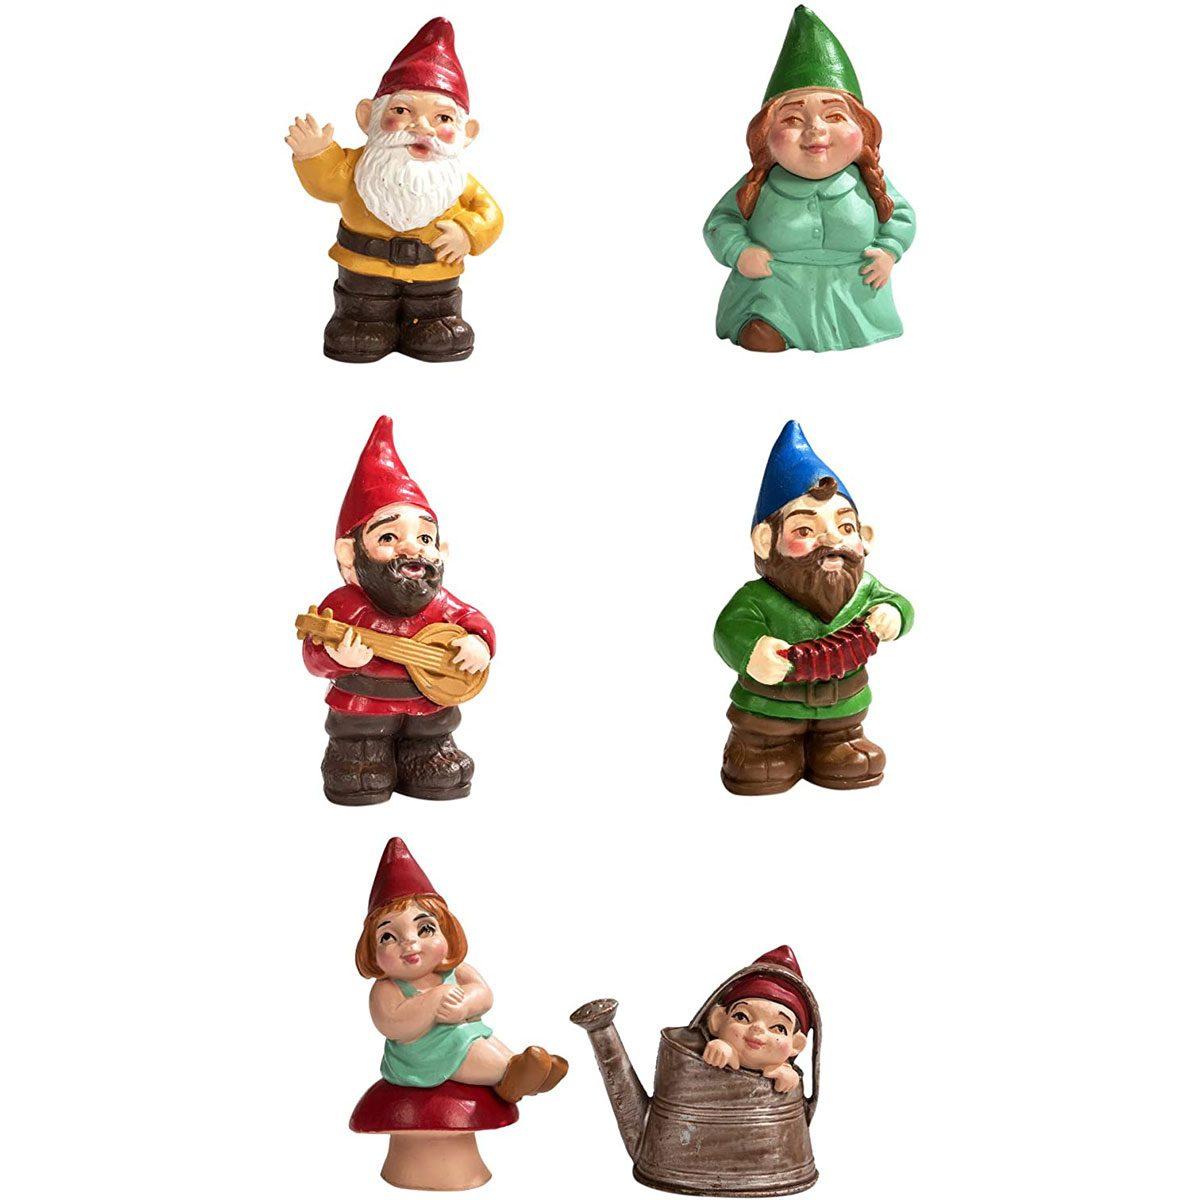 Six garden gnomes